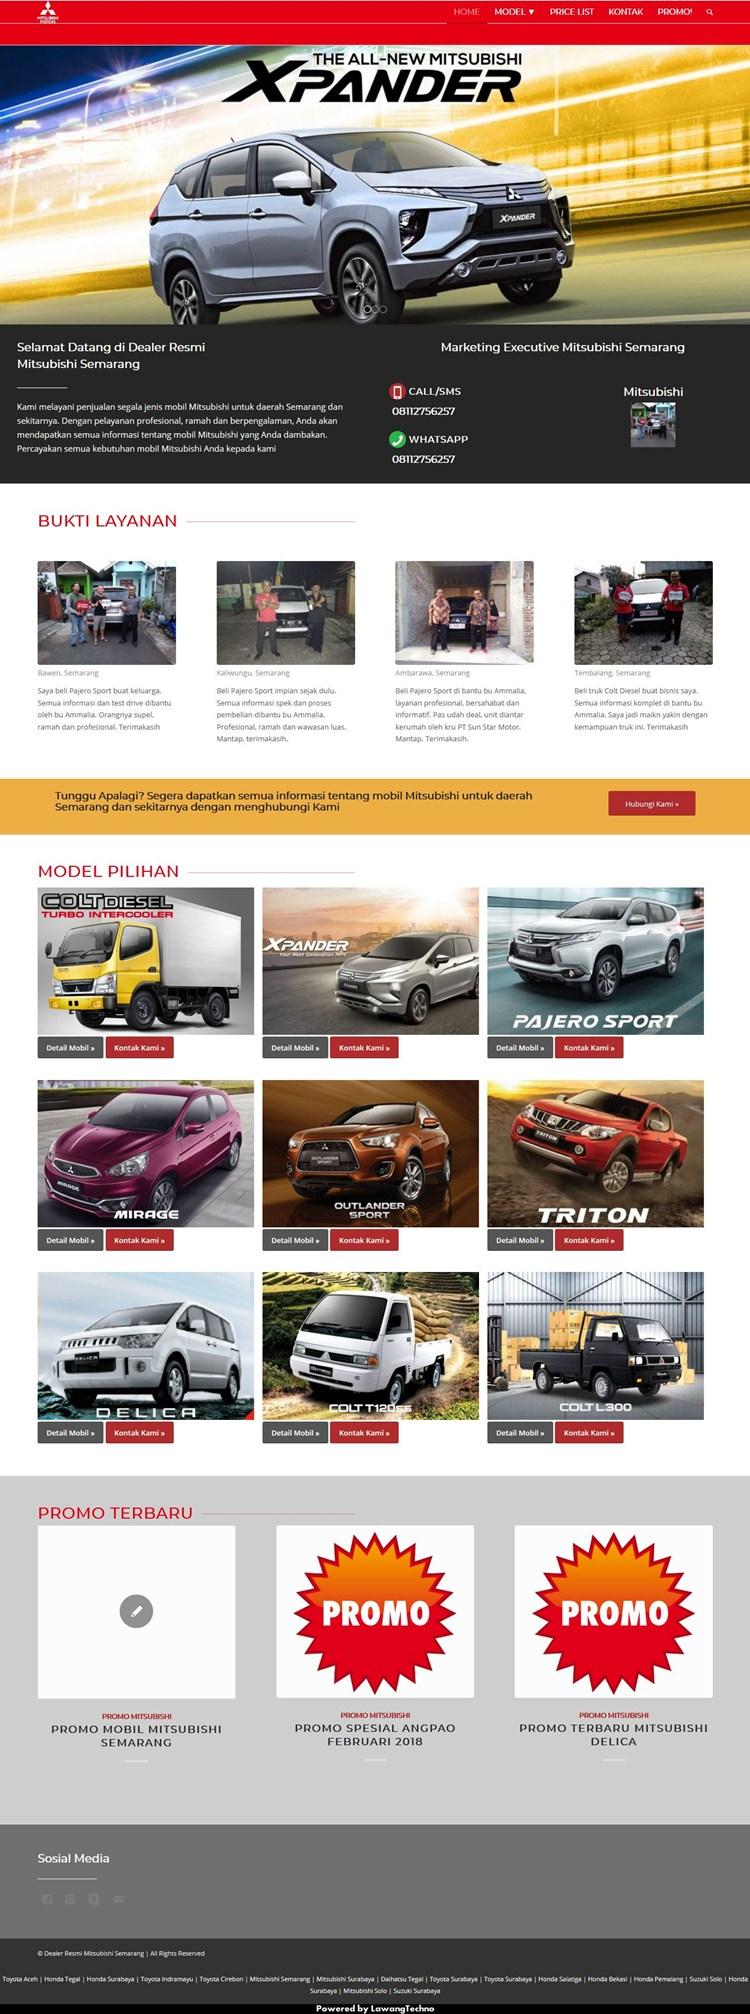 Mitsubishi semarang dealer